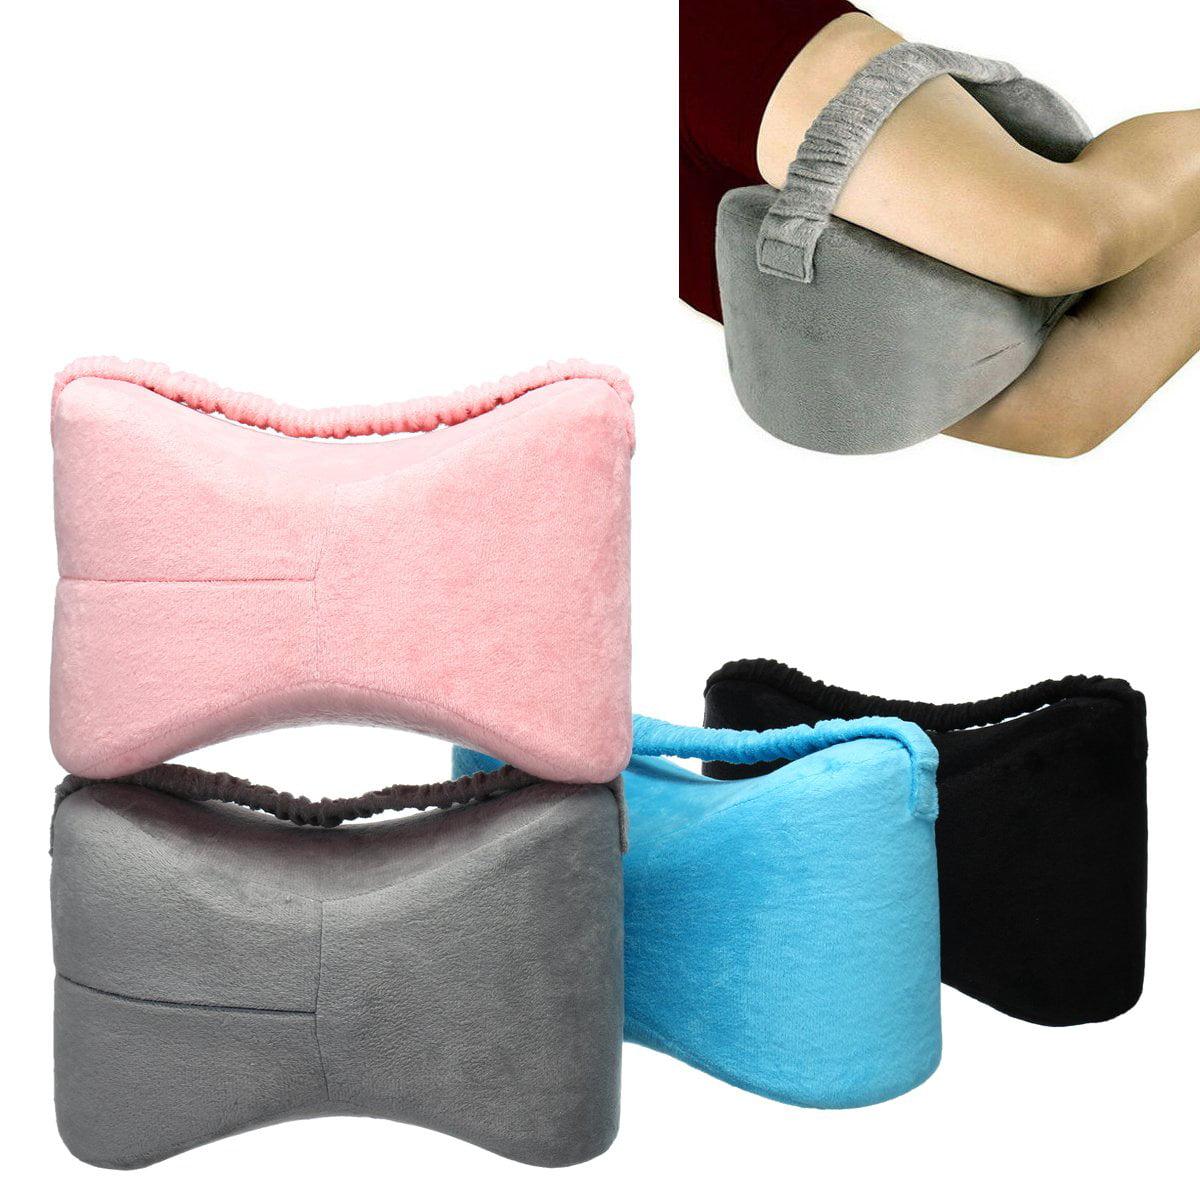 Bestller Memory Foam Knee Pillow For Side Sleepers Spacer